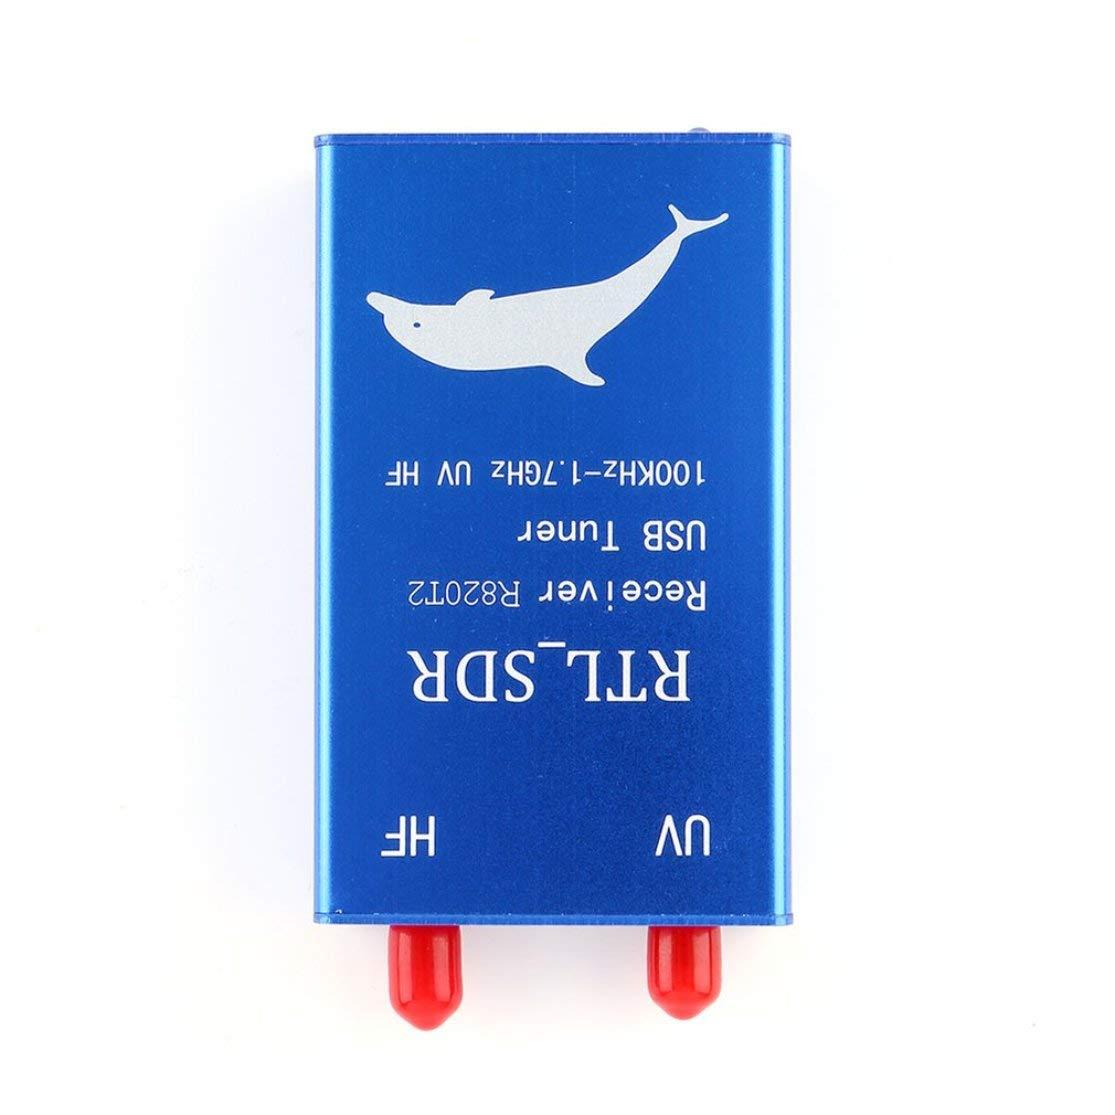 LouiseEvel215 Sintonizador USB Receptor RTL2832U Radio R820T2 100KHz-1.7GHz UHF VHF UV UV HF RTL SDR CW DSB LSB Radio Am FM Trabajar con PC